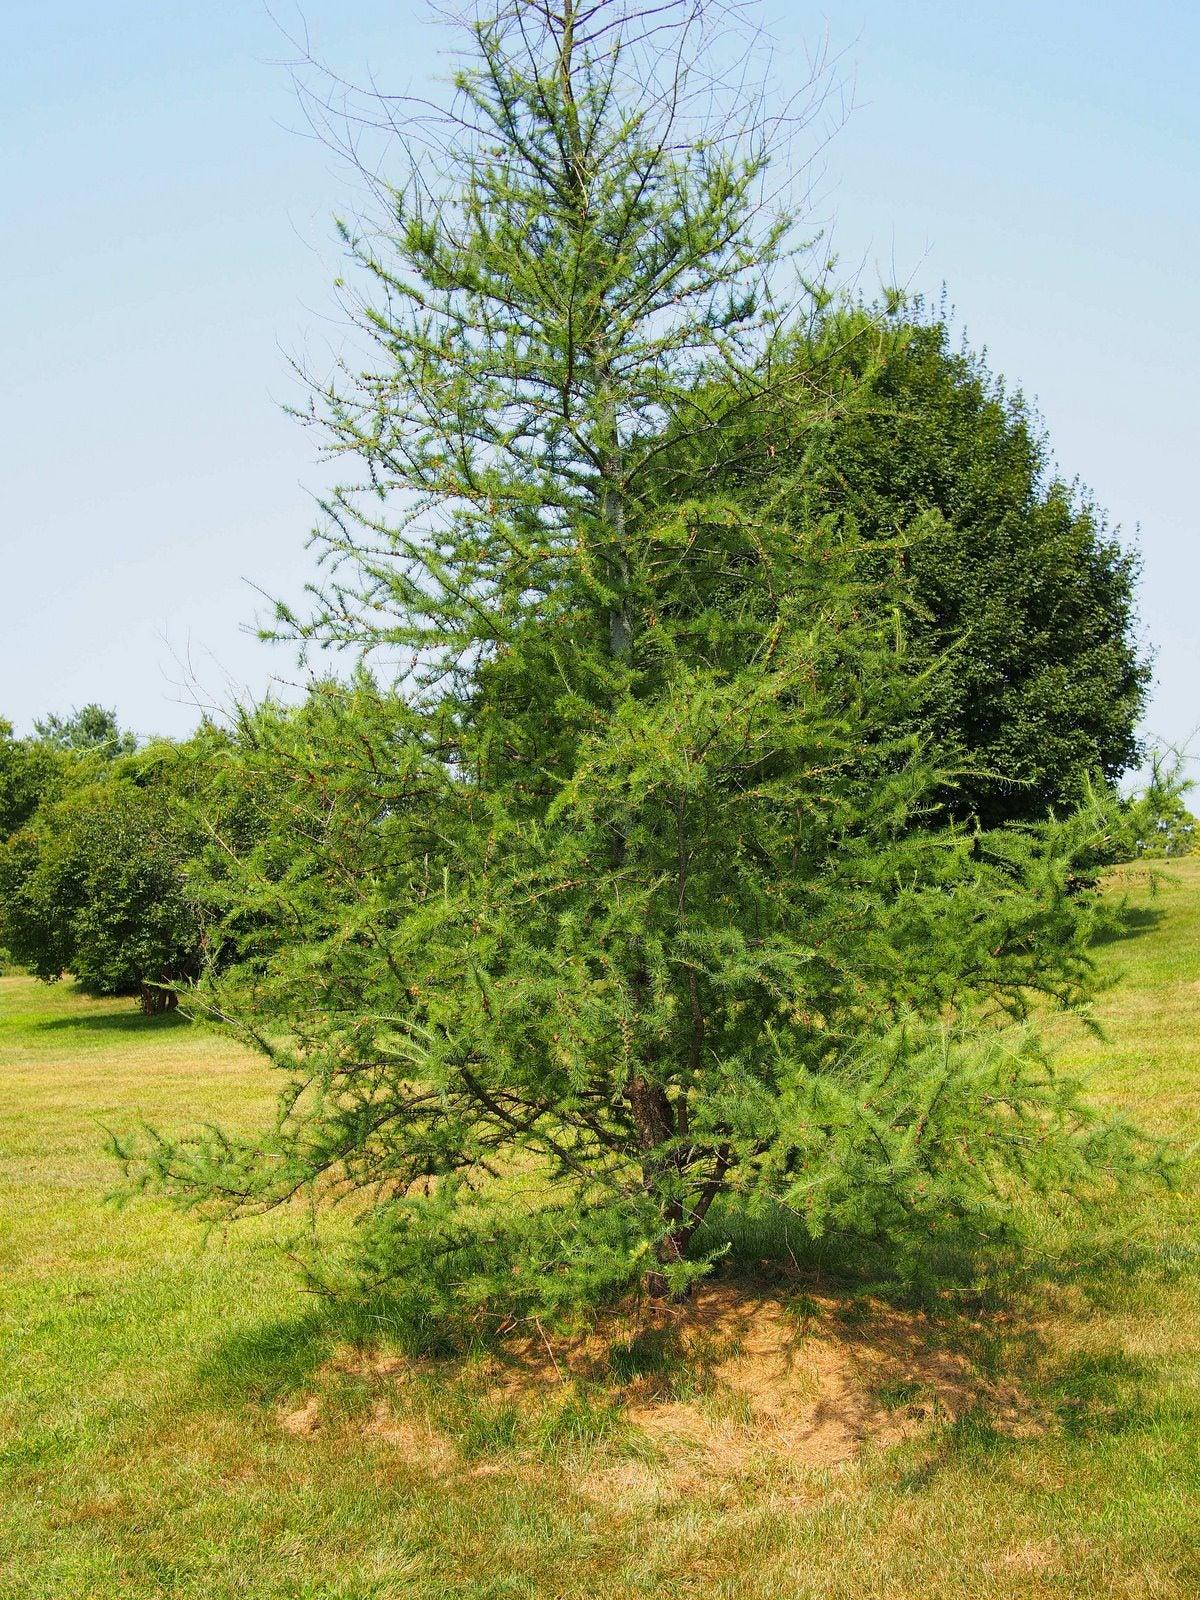 Information On Growing Okra And Harvesting Okra: Growing Tamarack Trees: Information And Care For Tamarack